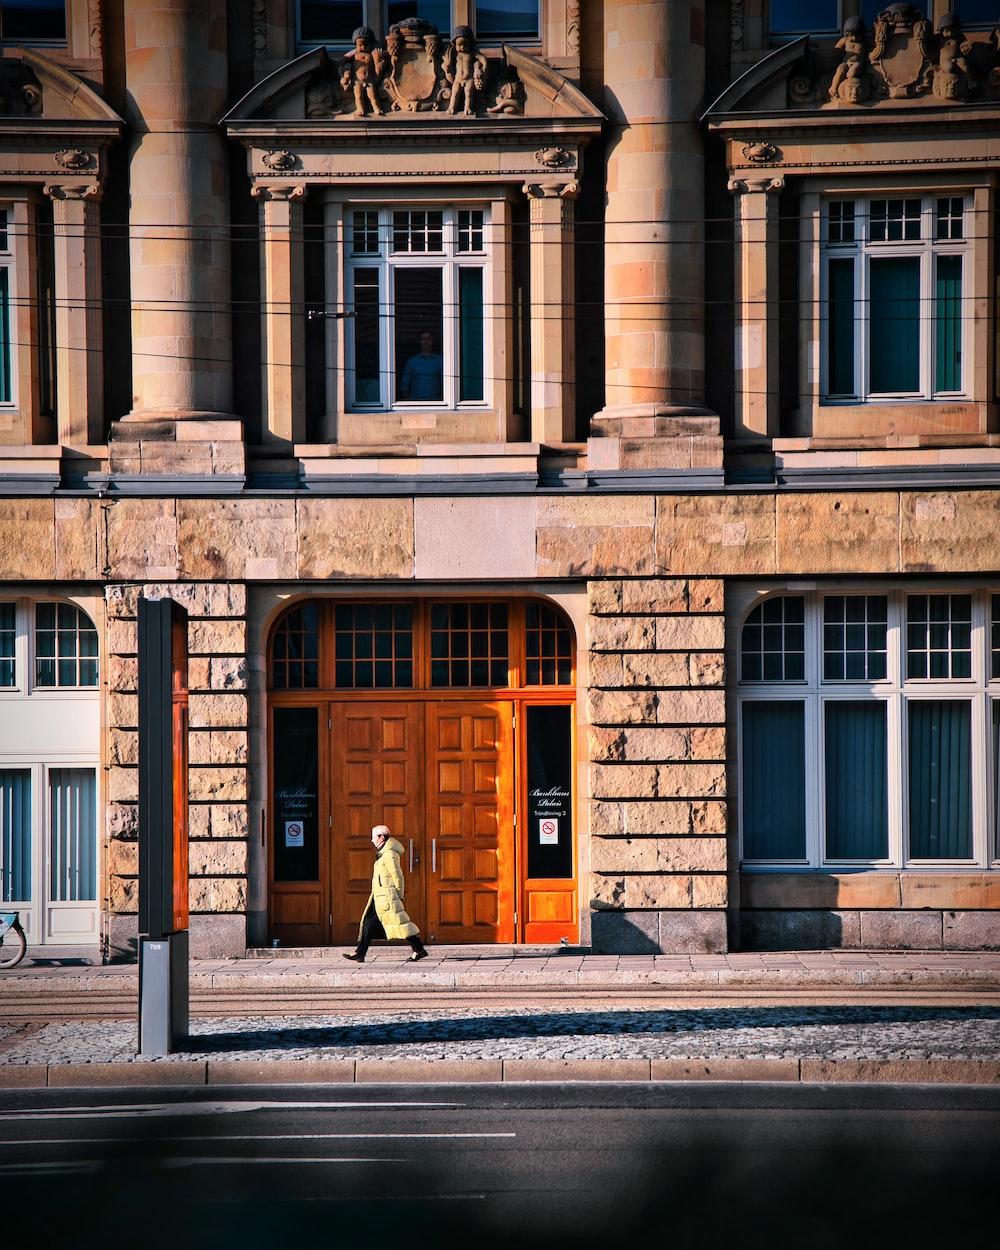 man in brown coat walking on sidewalk near brown concrete building during daytime